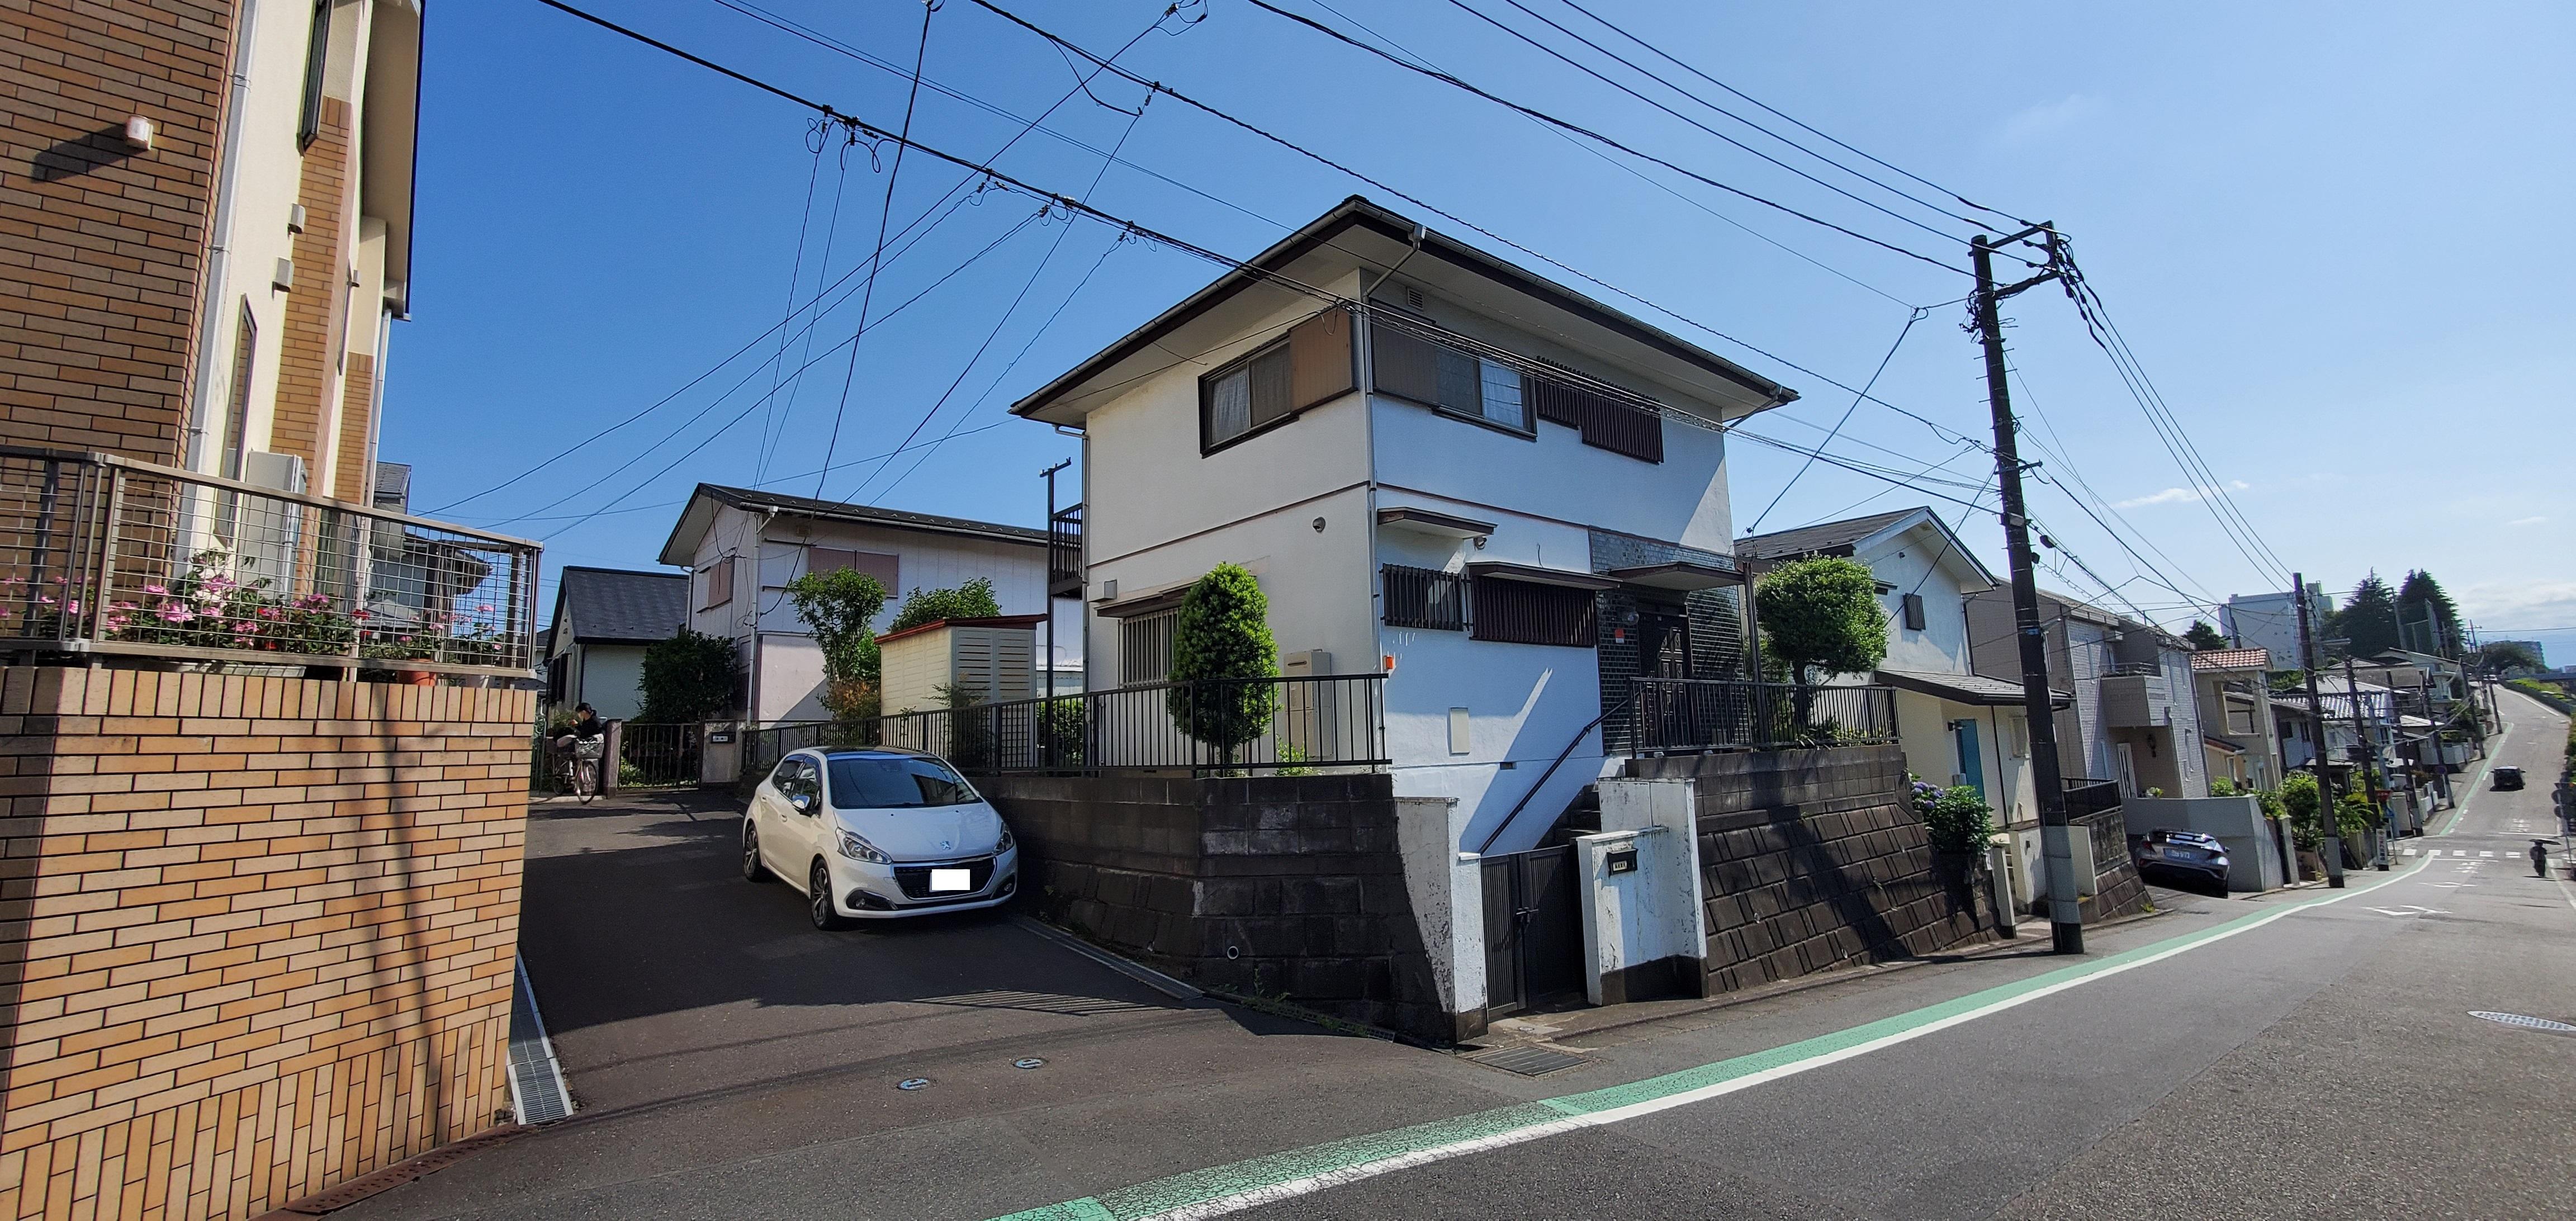 A image of 神奈川県大和市 解体工事【東京、埼玉、神奈川の解体工事なら東央建設へ】